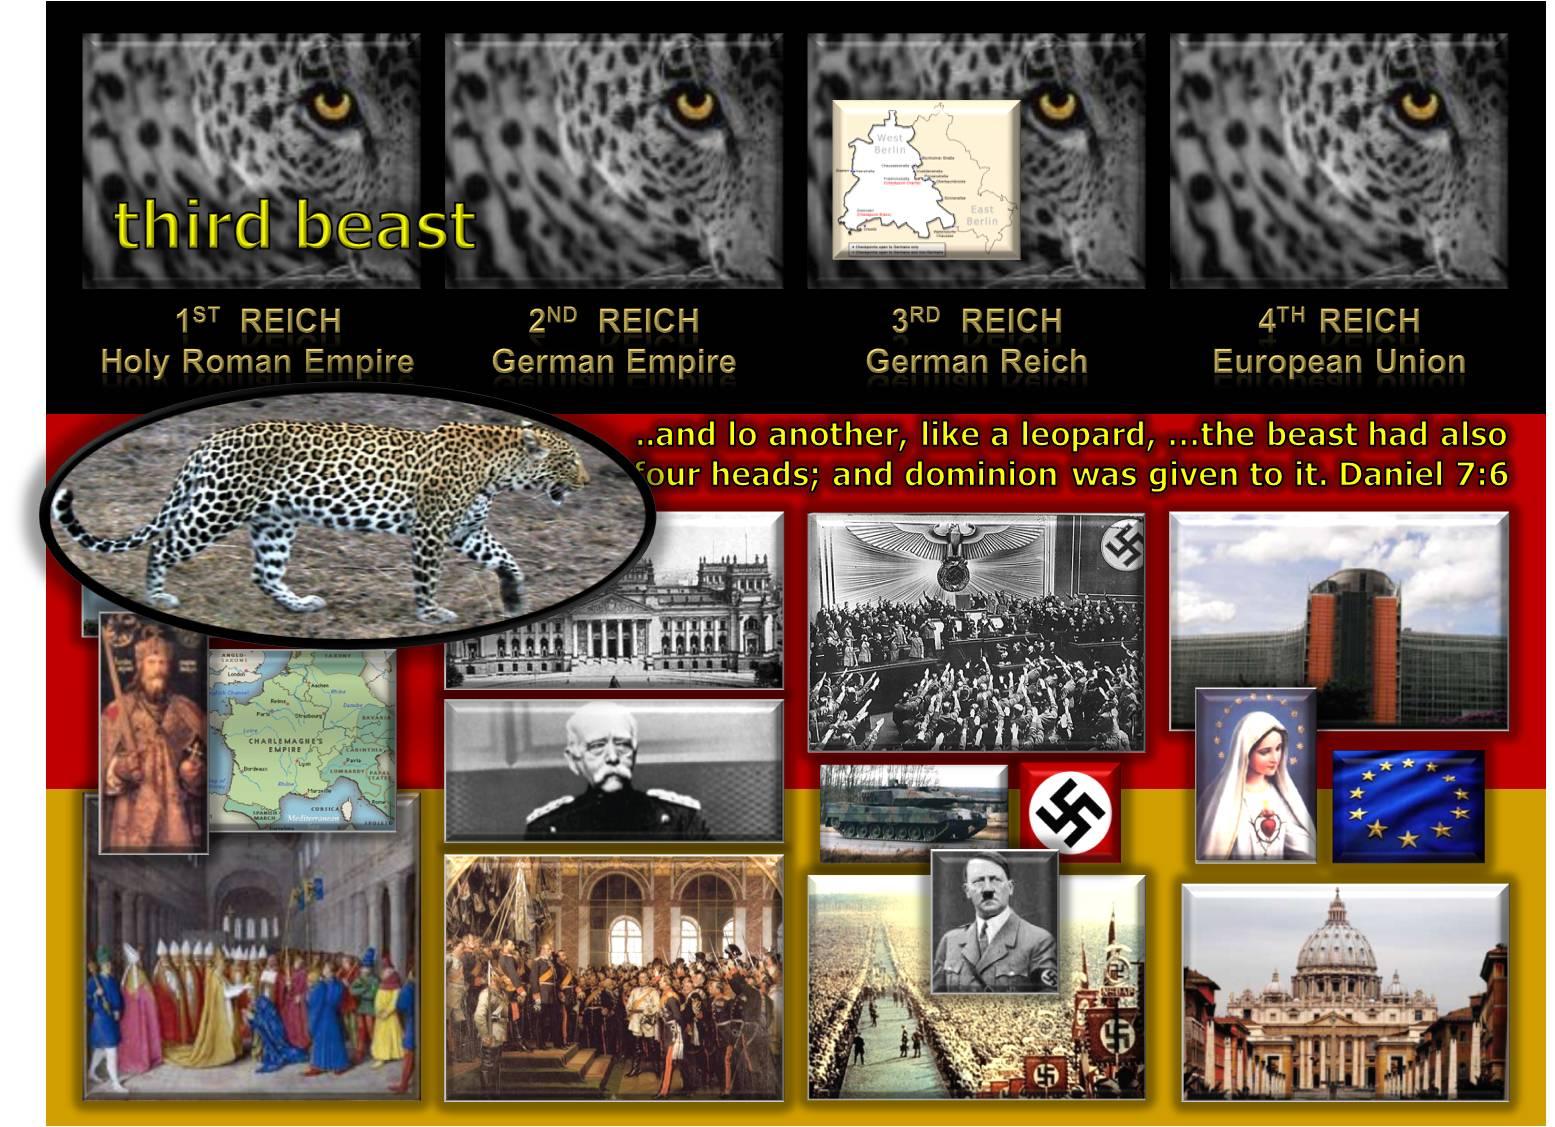 Four Reichs